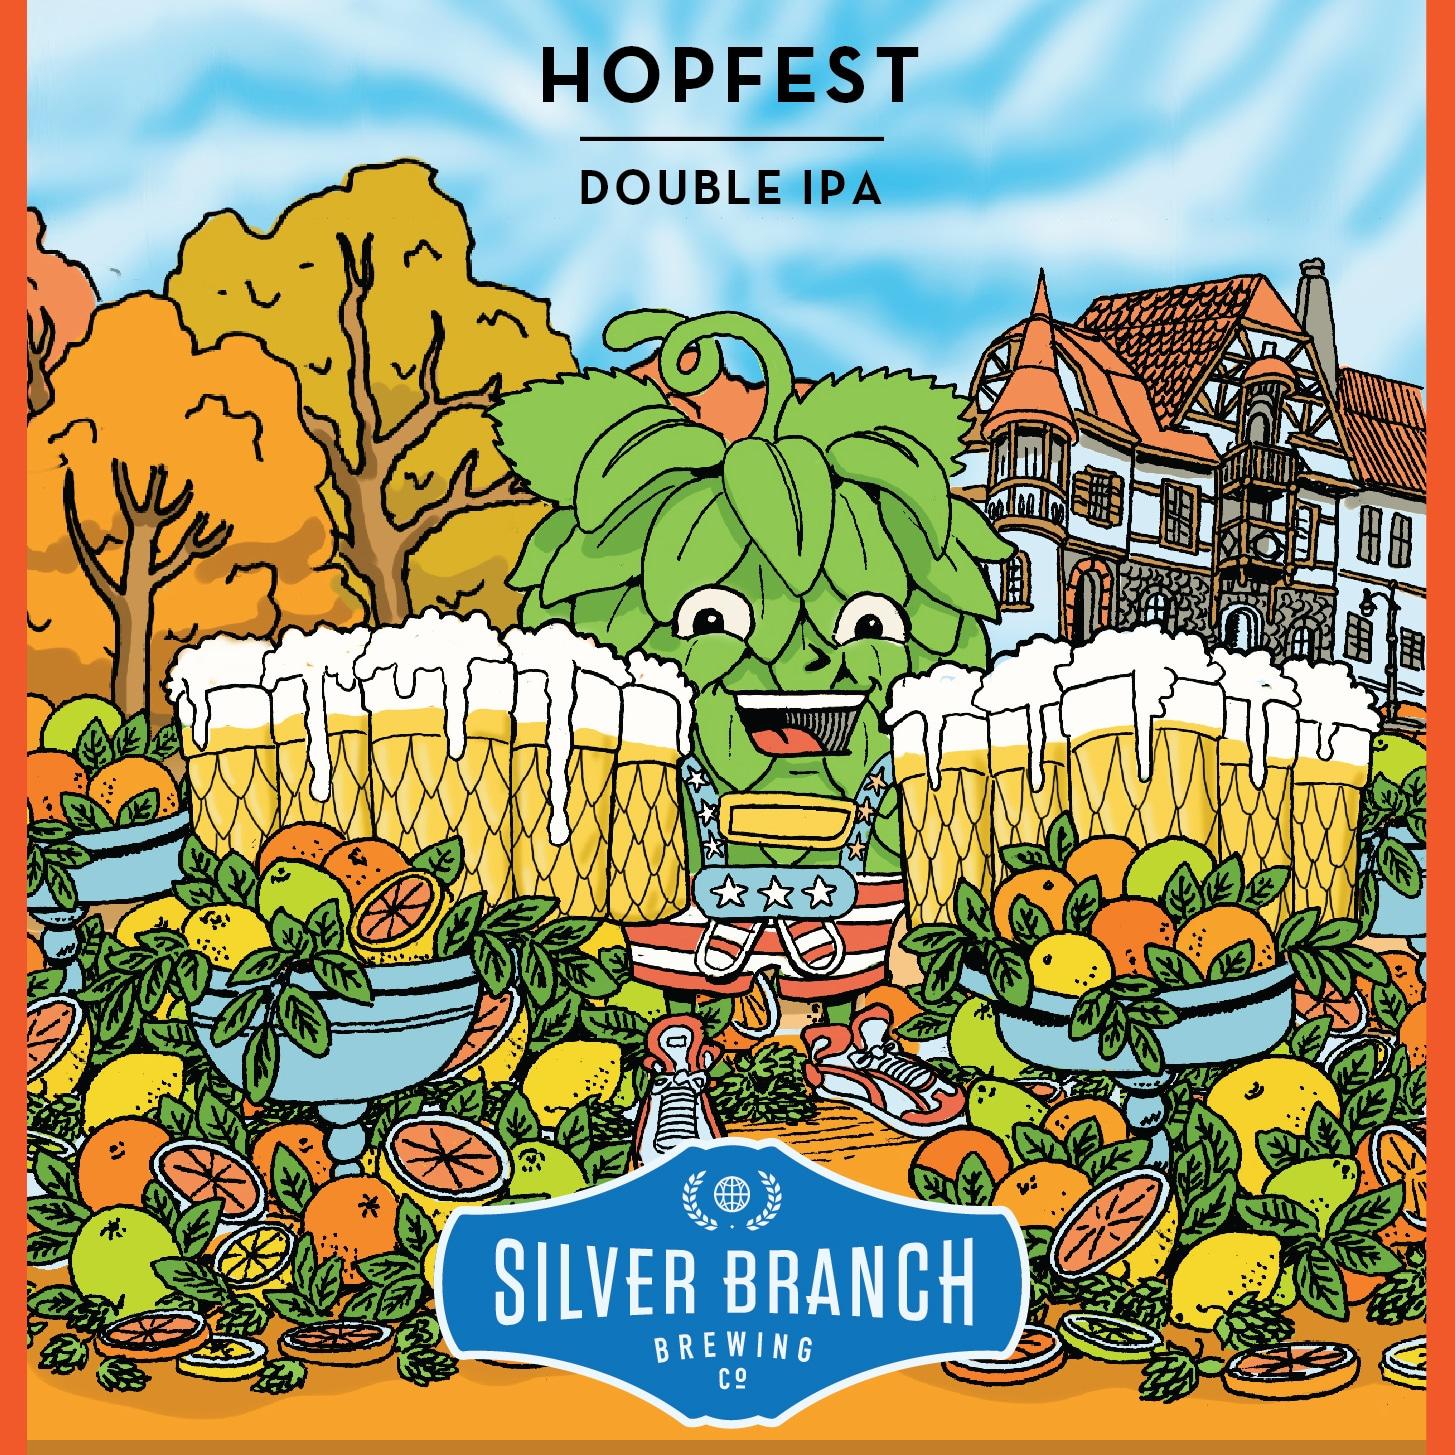 Hopfest